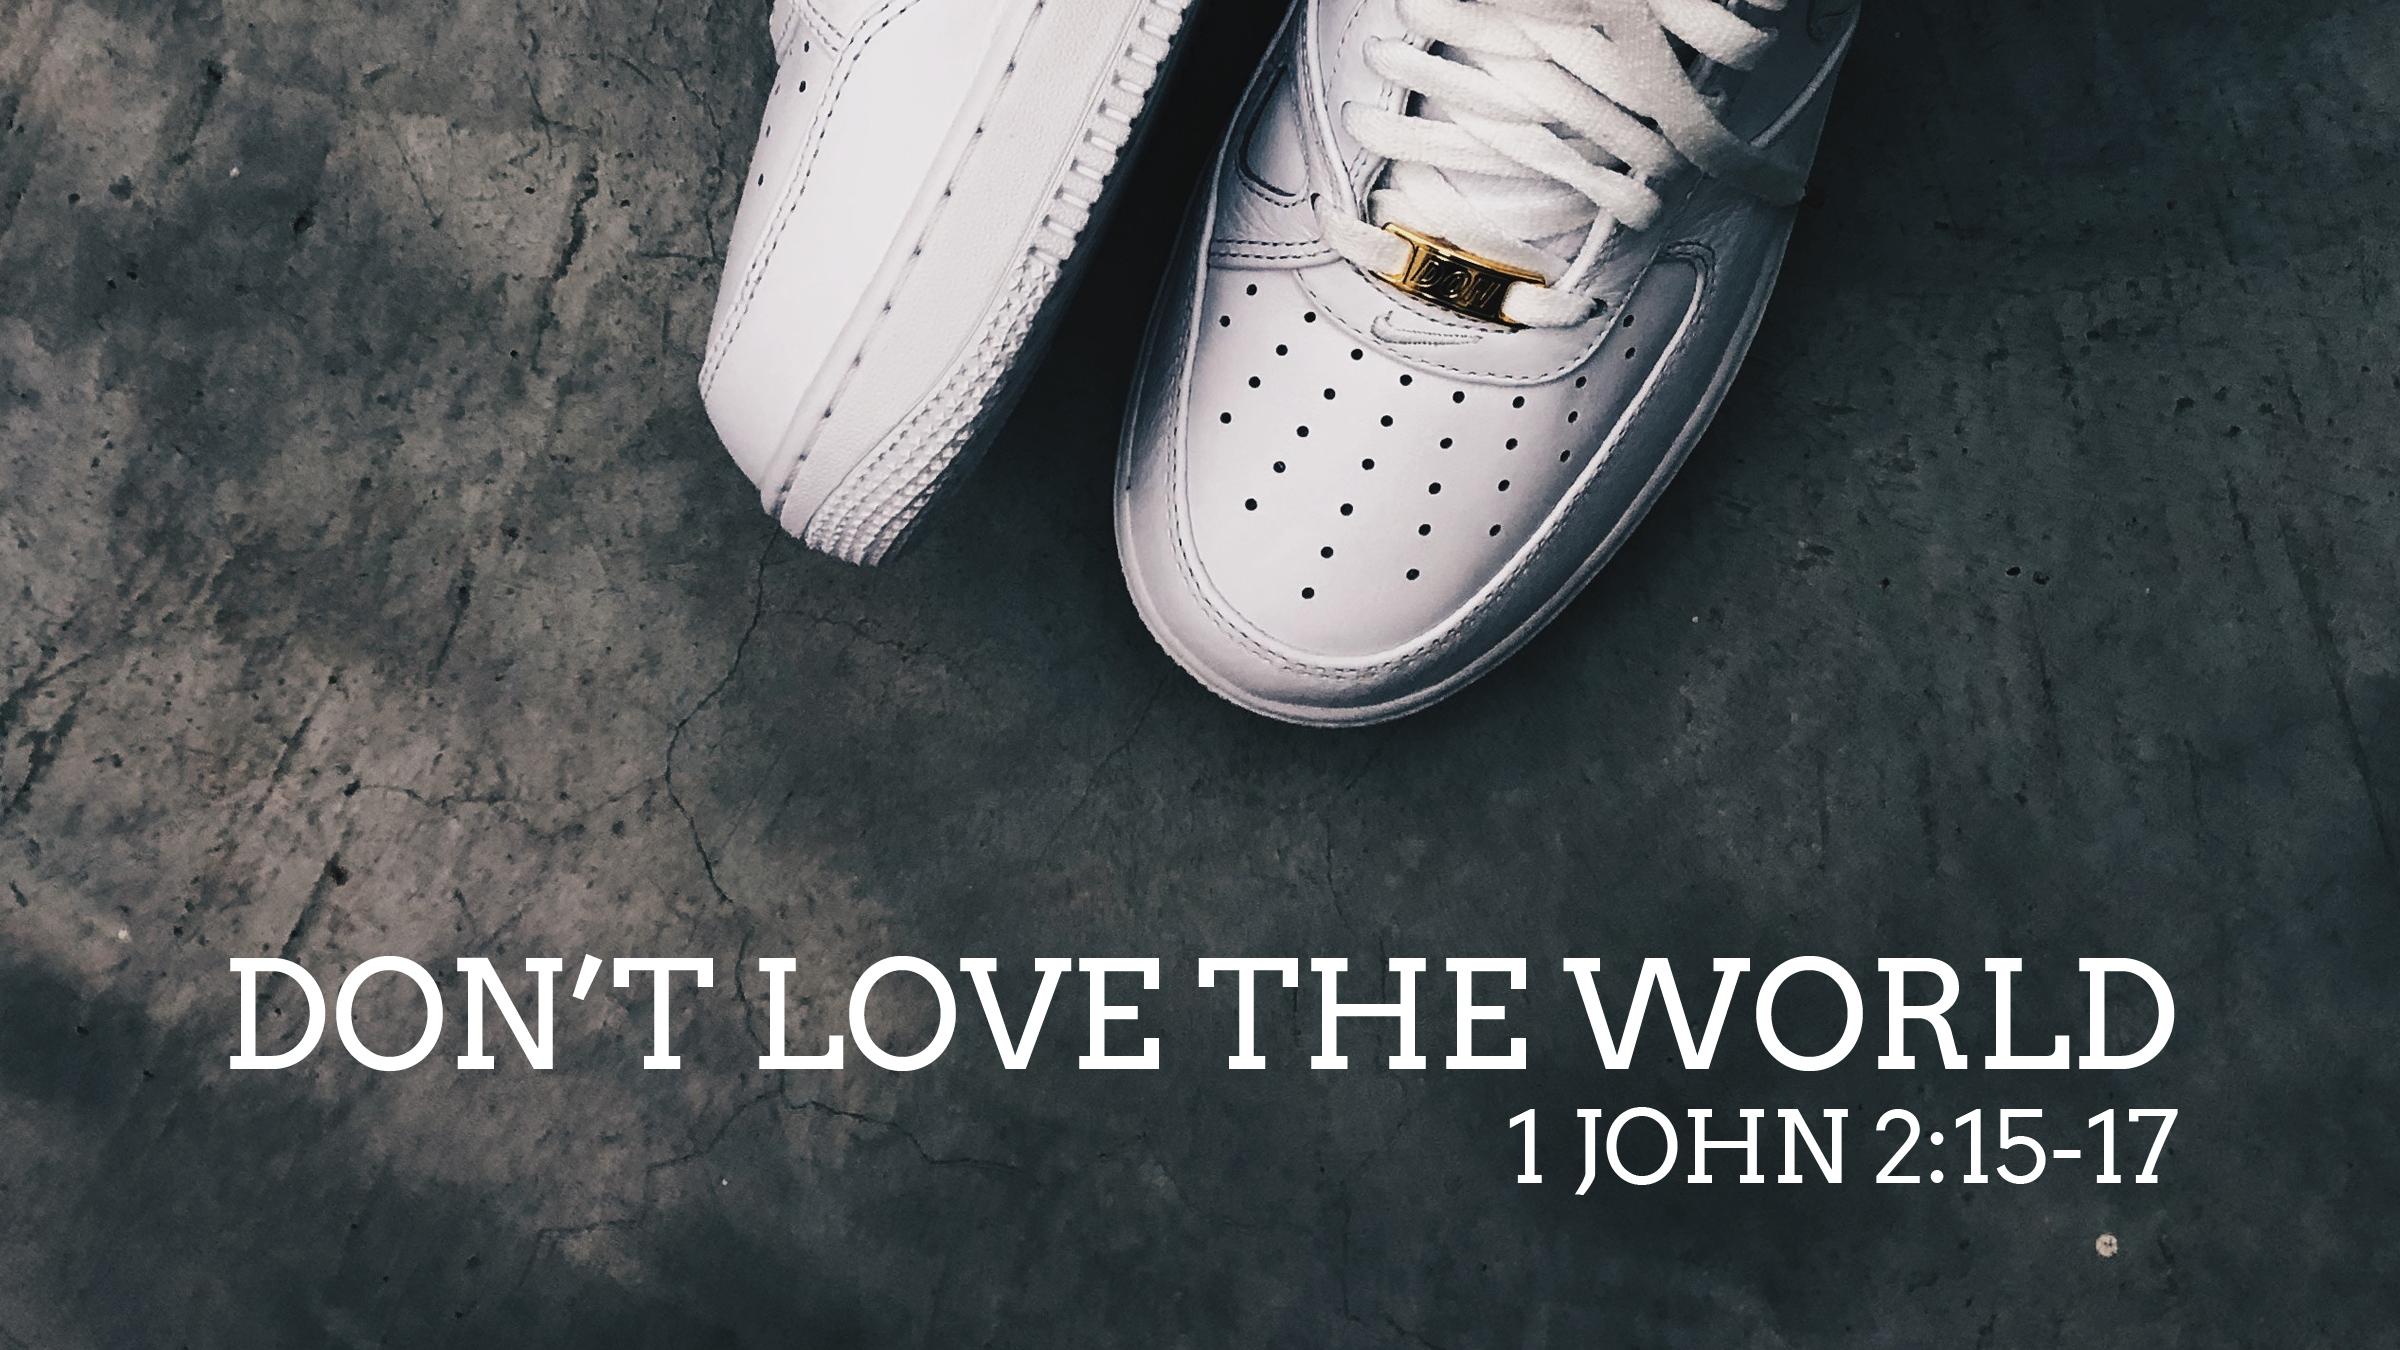 Don't love the world.jpg